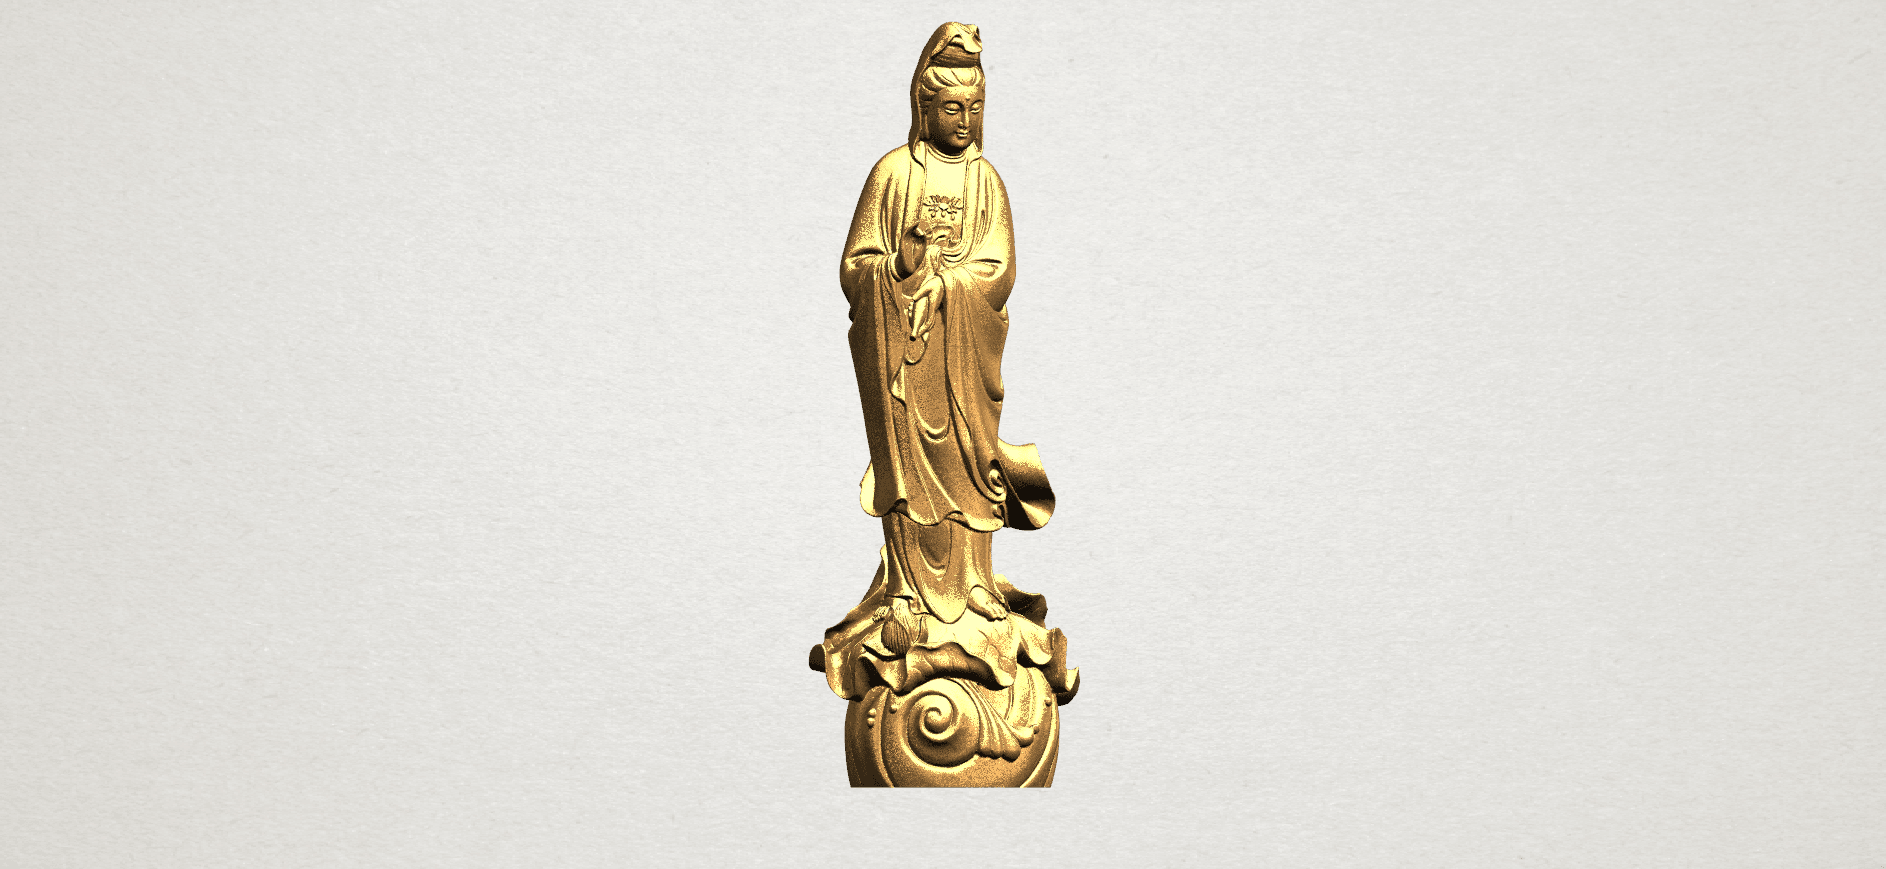 Avalokitesvara Buddha - Standing (i) A08.png Download free STL file Avalokitesvara Bodhisattva - Standing 01 • 3D printable design, GeorgesNikkei